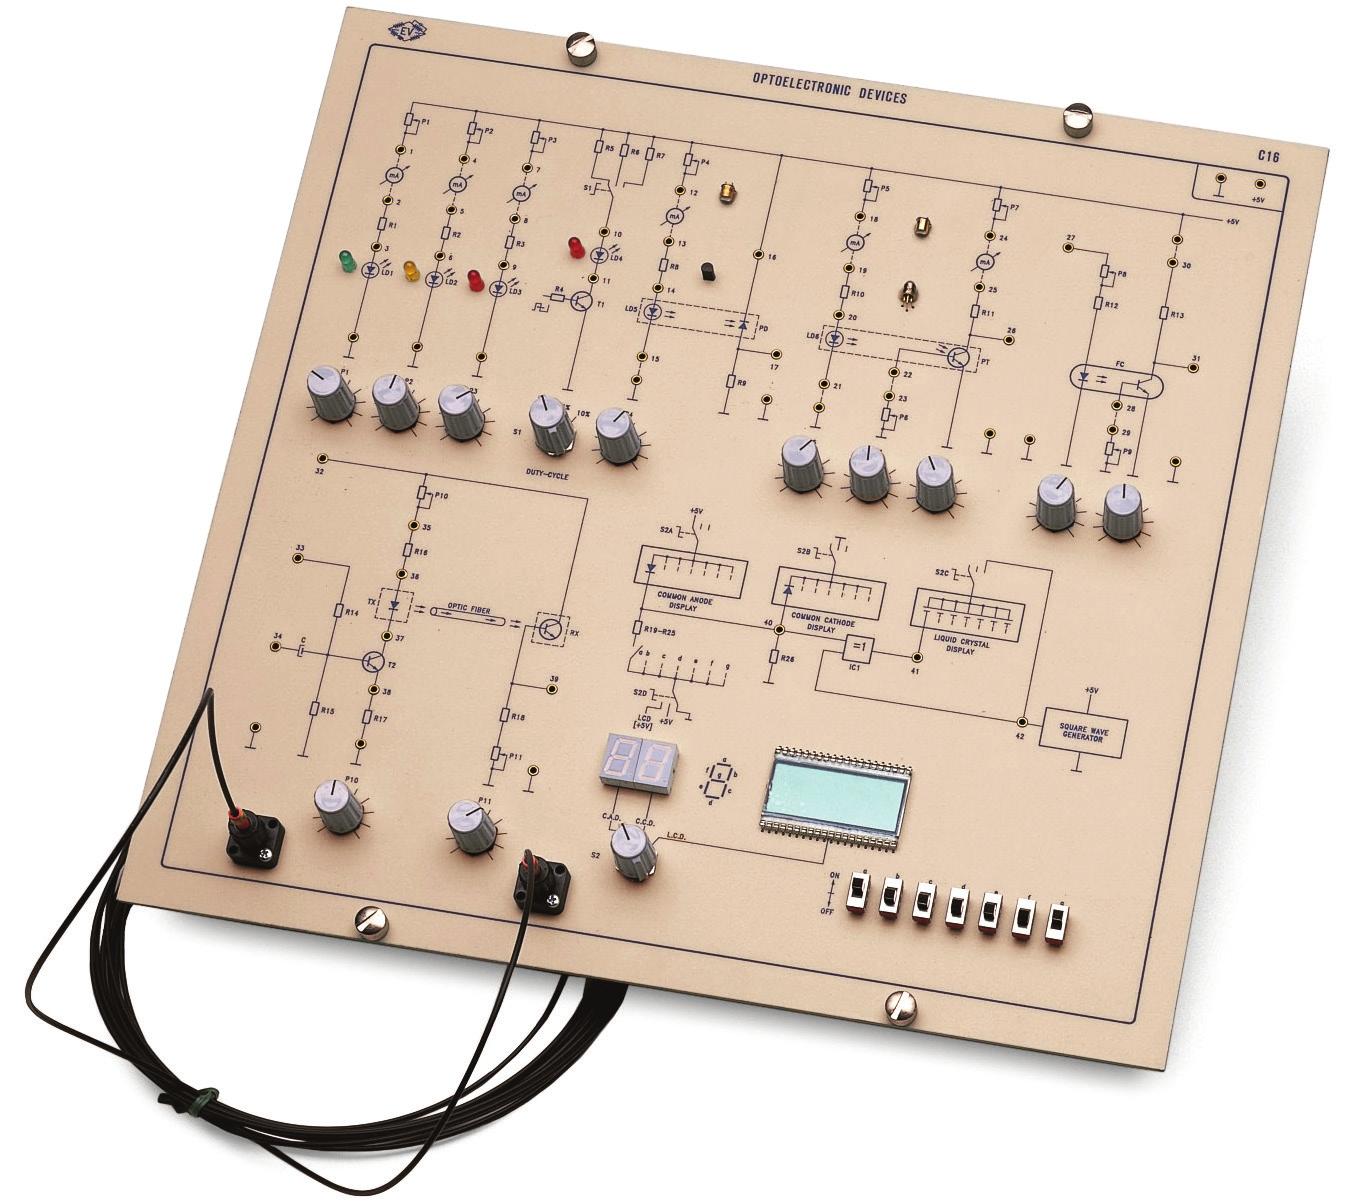 Eletrônica Industrial Avançada: Dispositivos Optoeletrônicos – Ref. DT-ET015.02